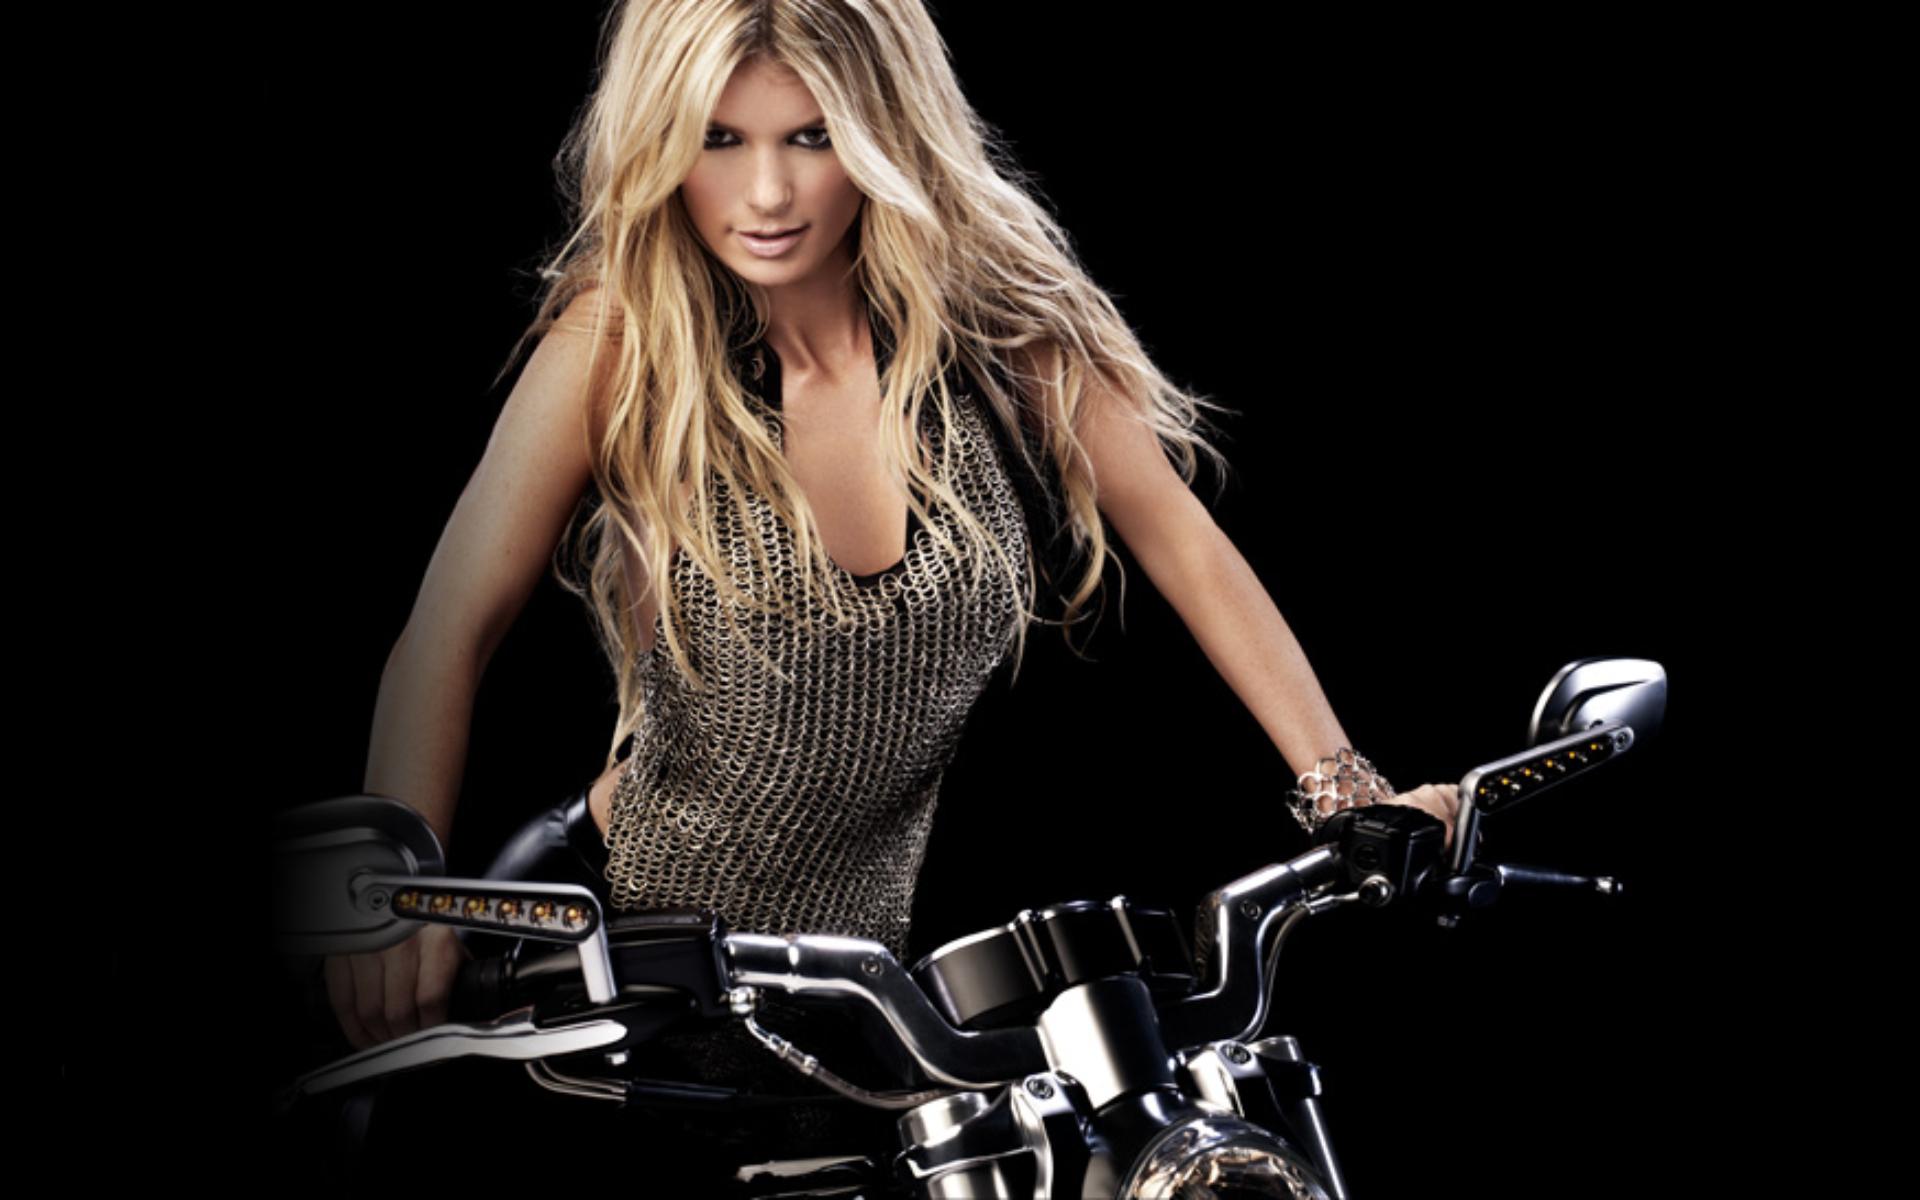 Download Wallpapers Harley Davidson Girls Chopper Bobber Girl Store 1920x1200